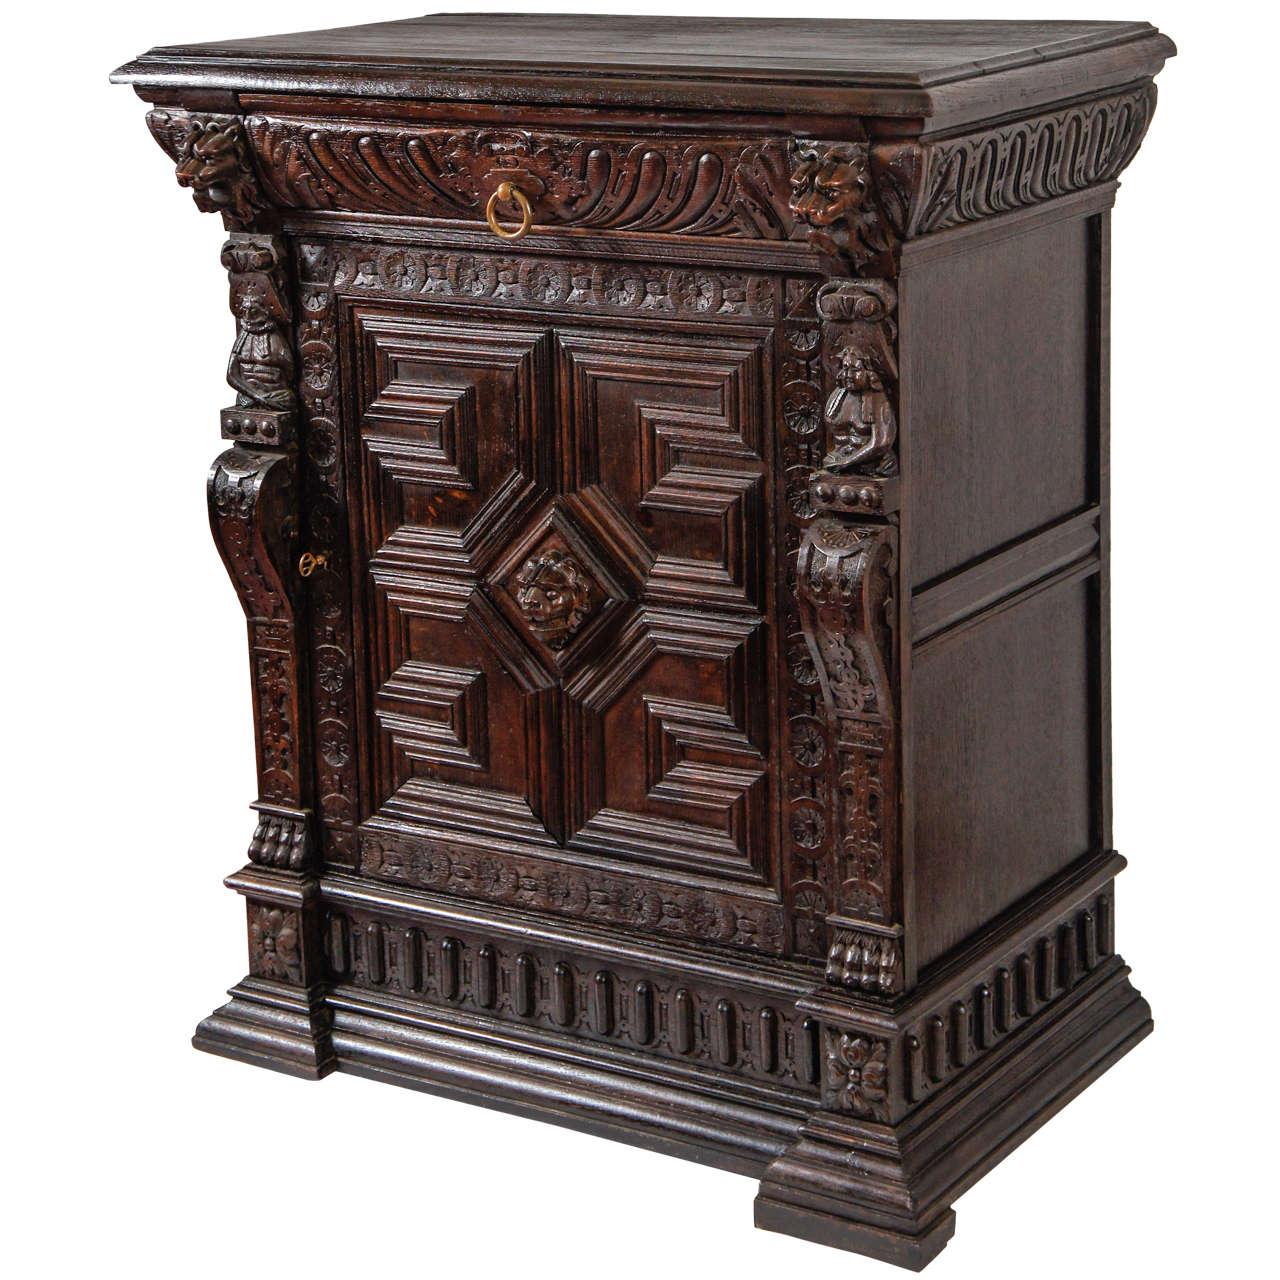 Antique hand carved oak cabinet at 1stdibs for Carved kitchen cabinets